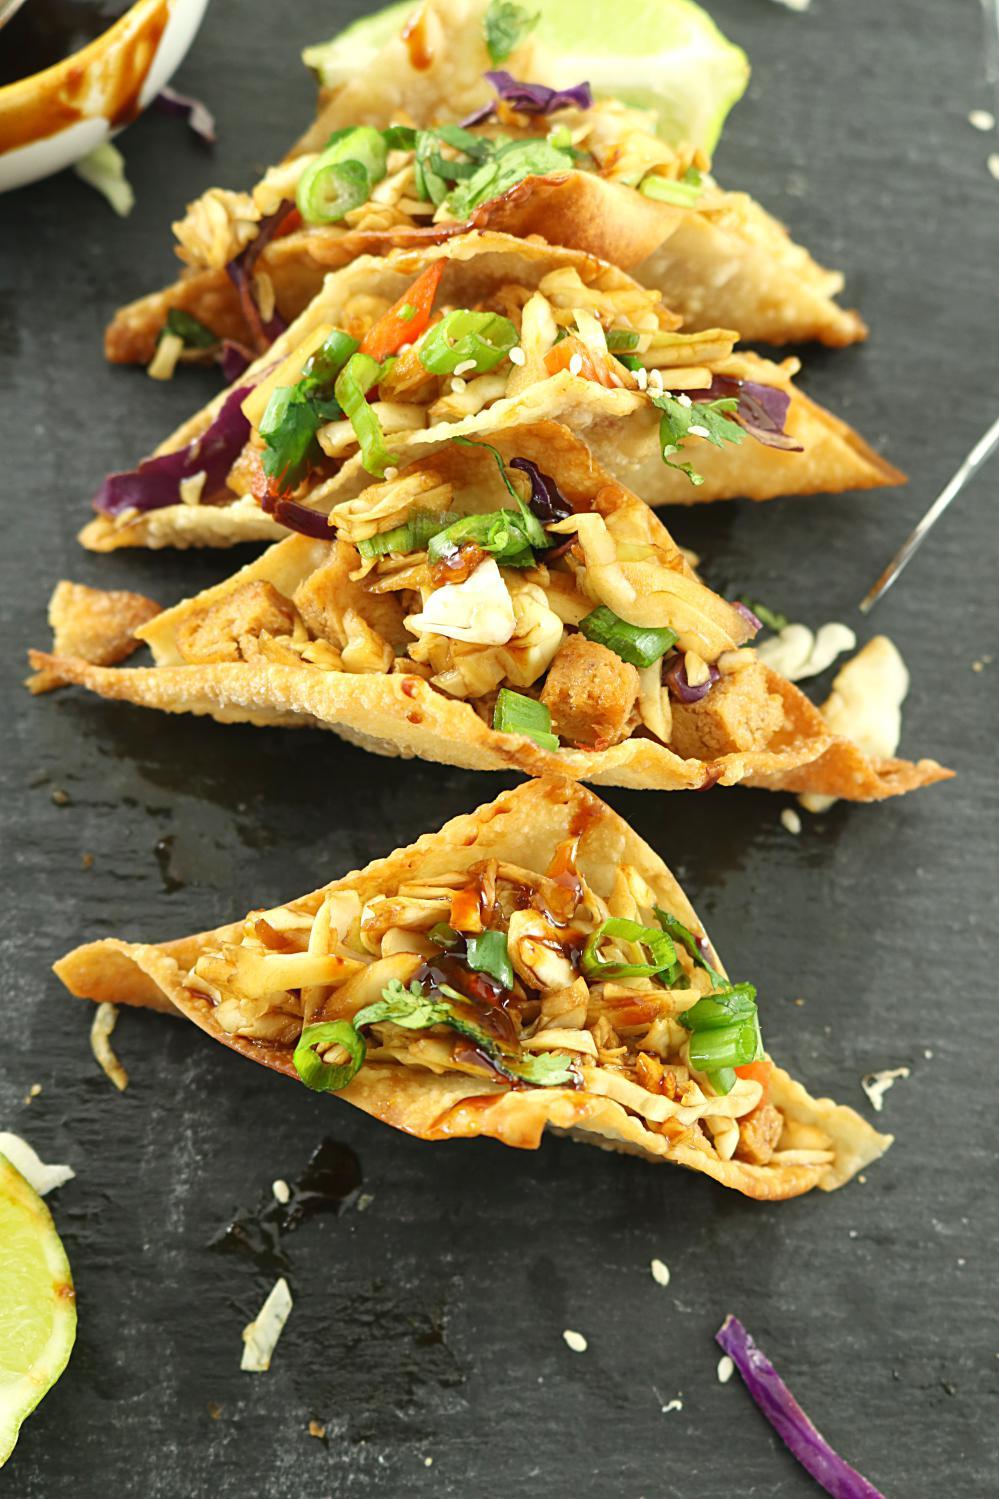 Grilled Tofu Wonton Tacos or Bowls